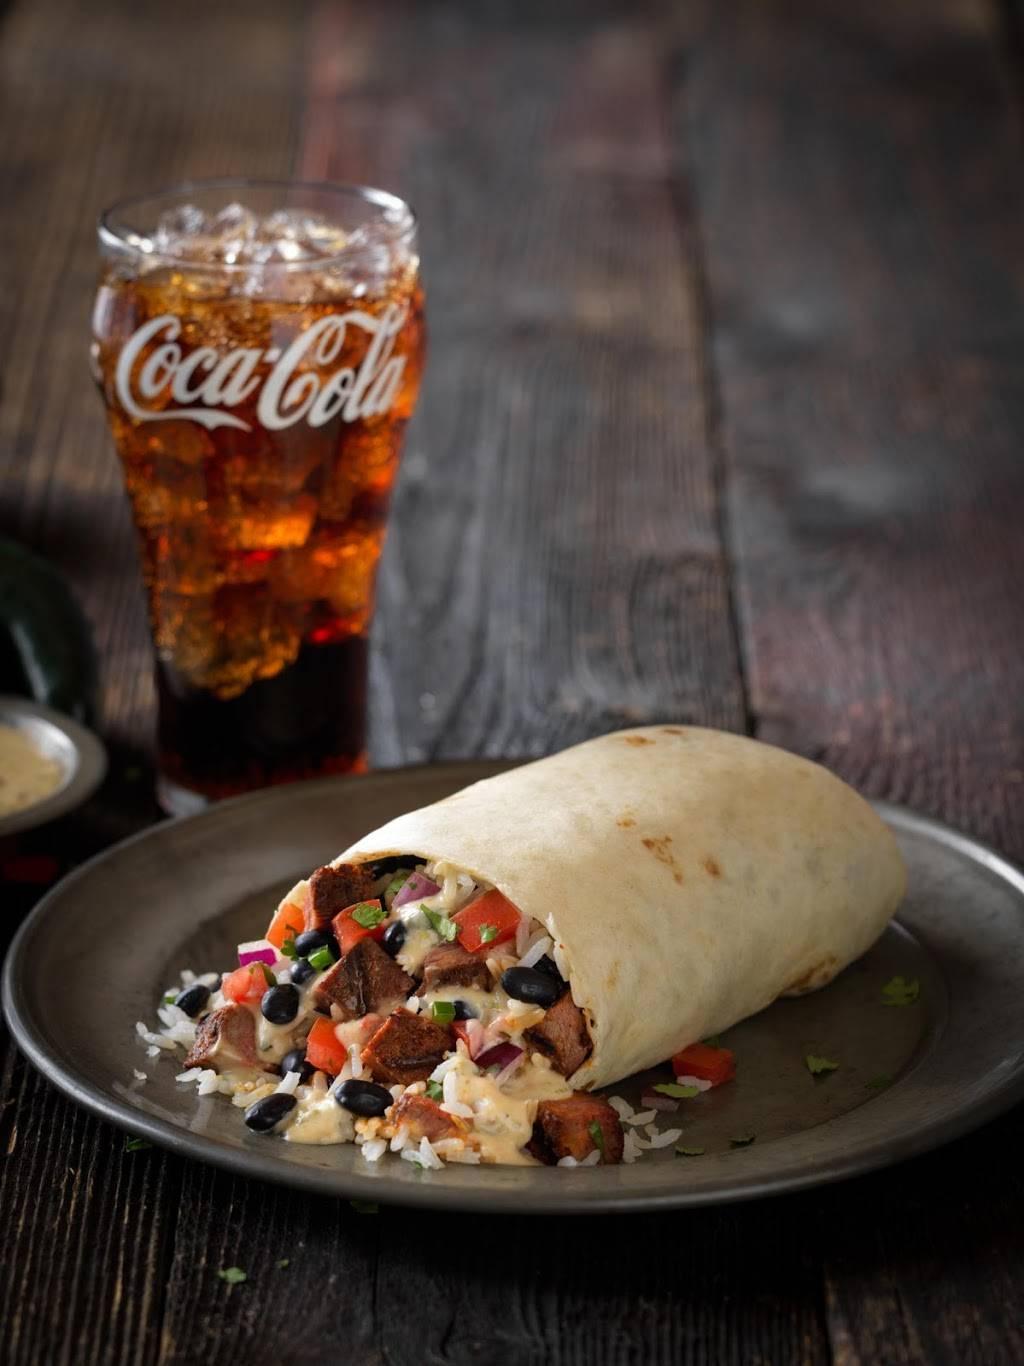 QDOBA Mexican Eats | restaurant | 950 Frontenac Dr, Winona, MN 55987, USA | 5074742200 OR +1 507-474-2200